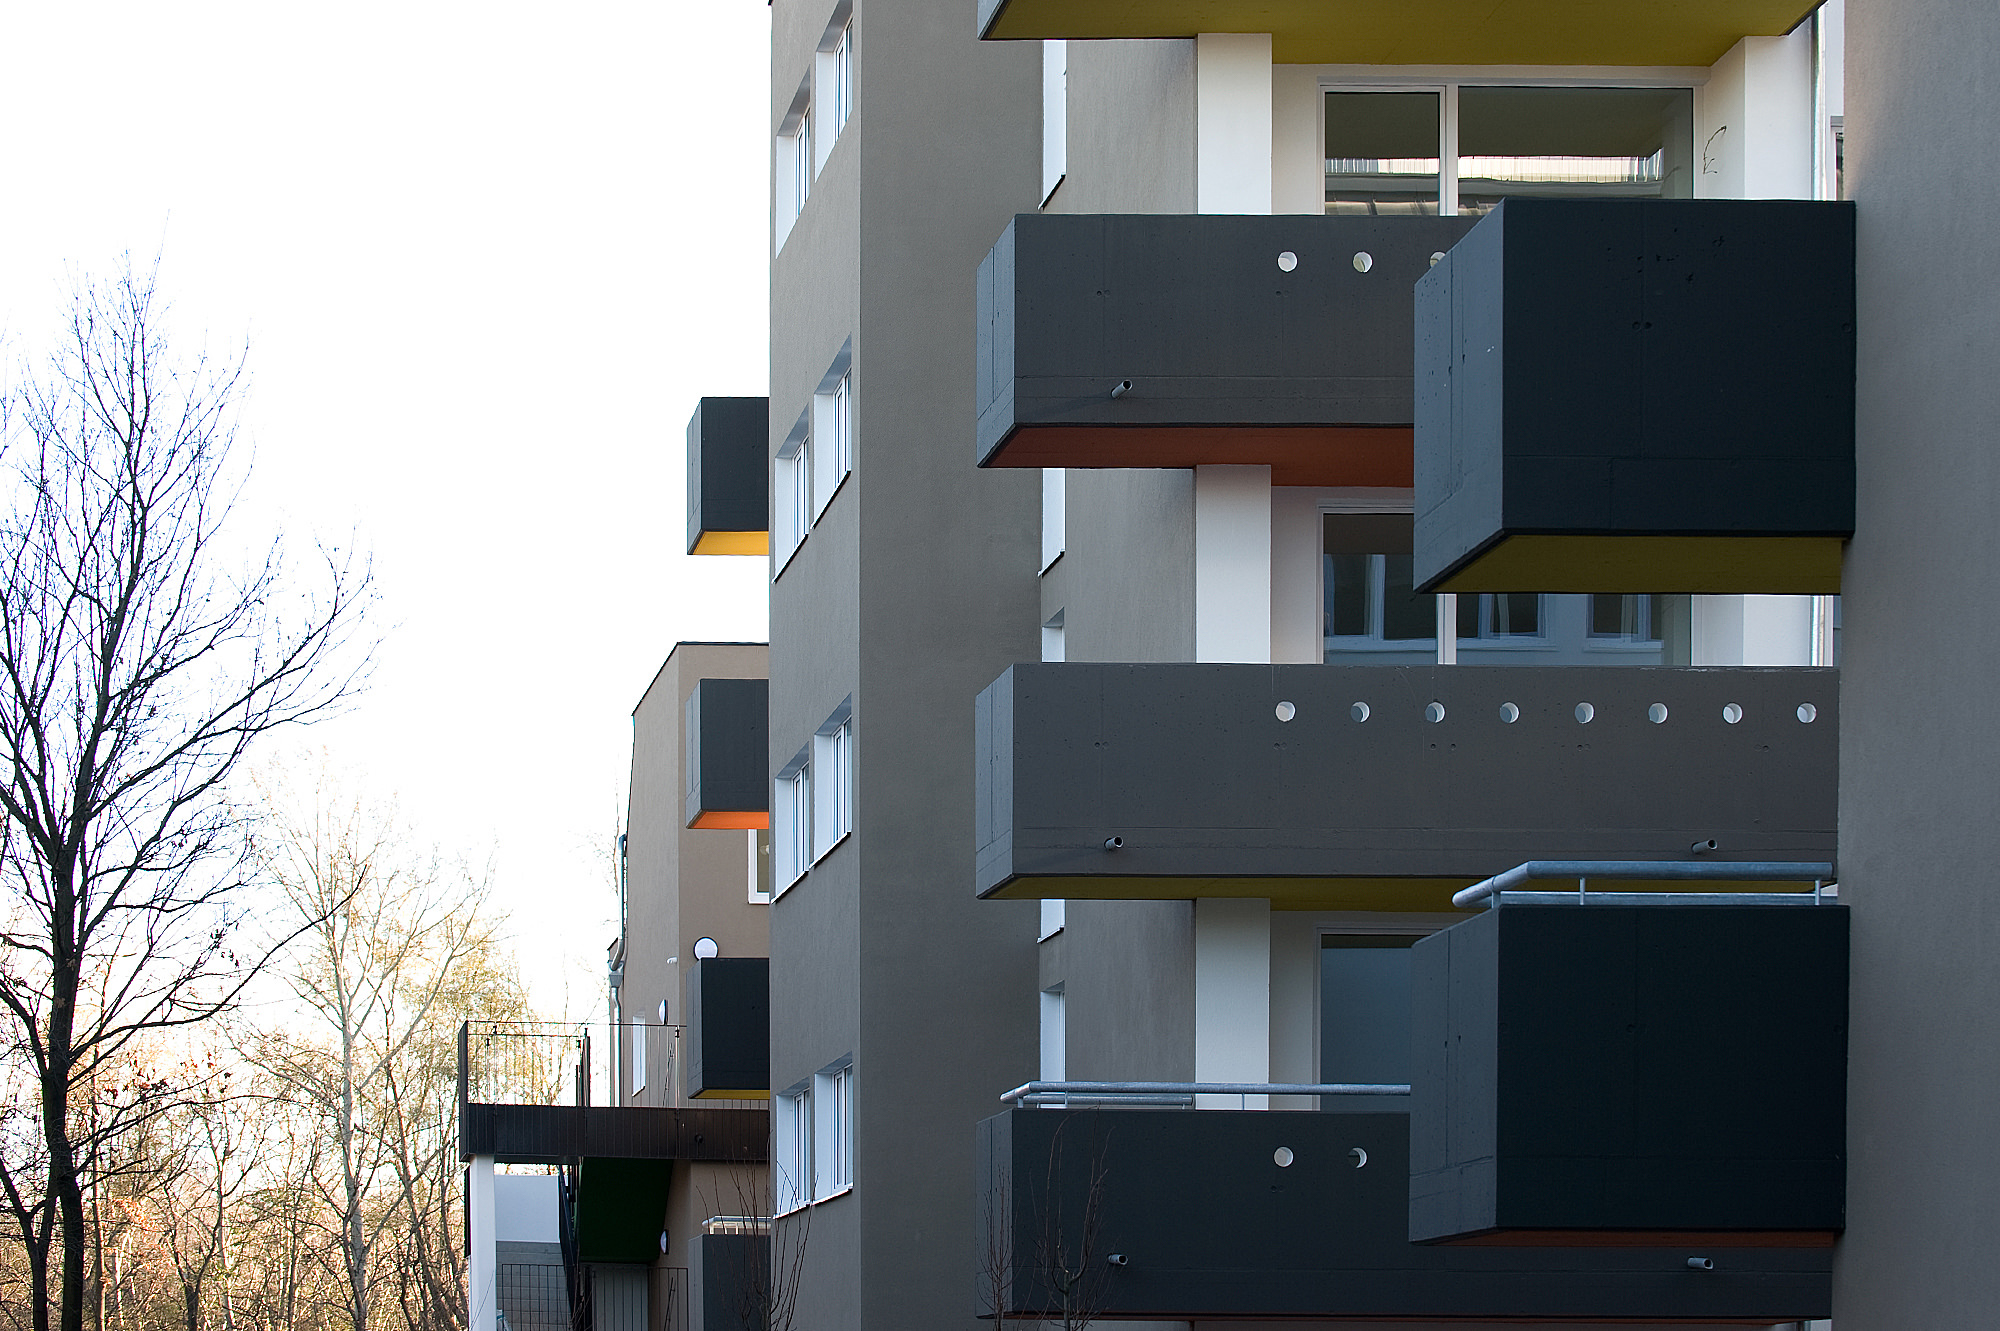 moselgasse 05 wohnbau 1100 wien junger beer architektur